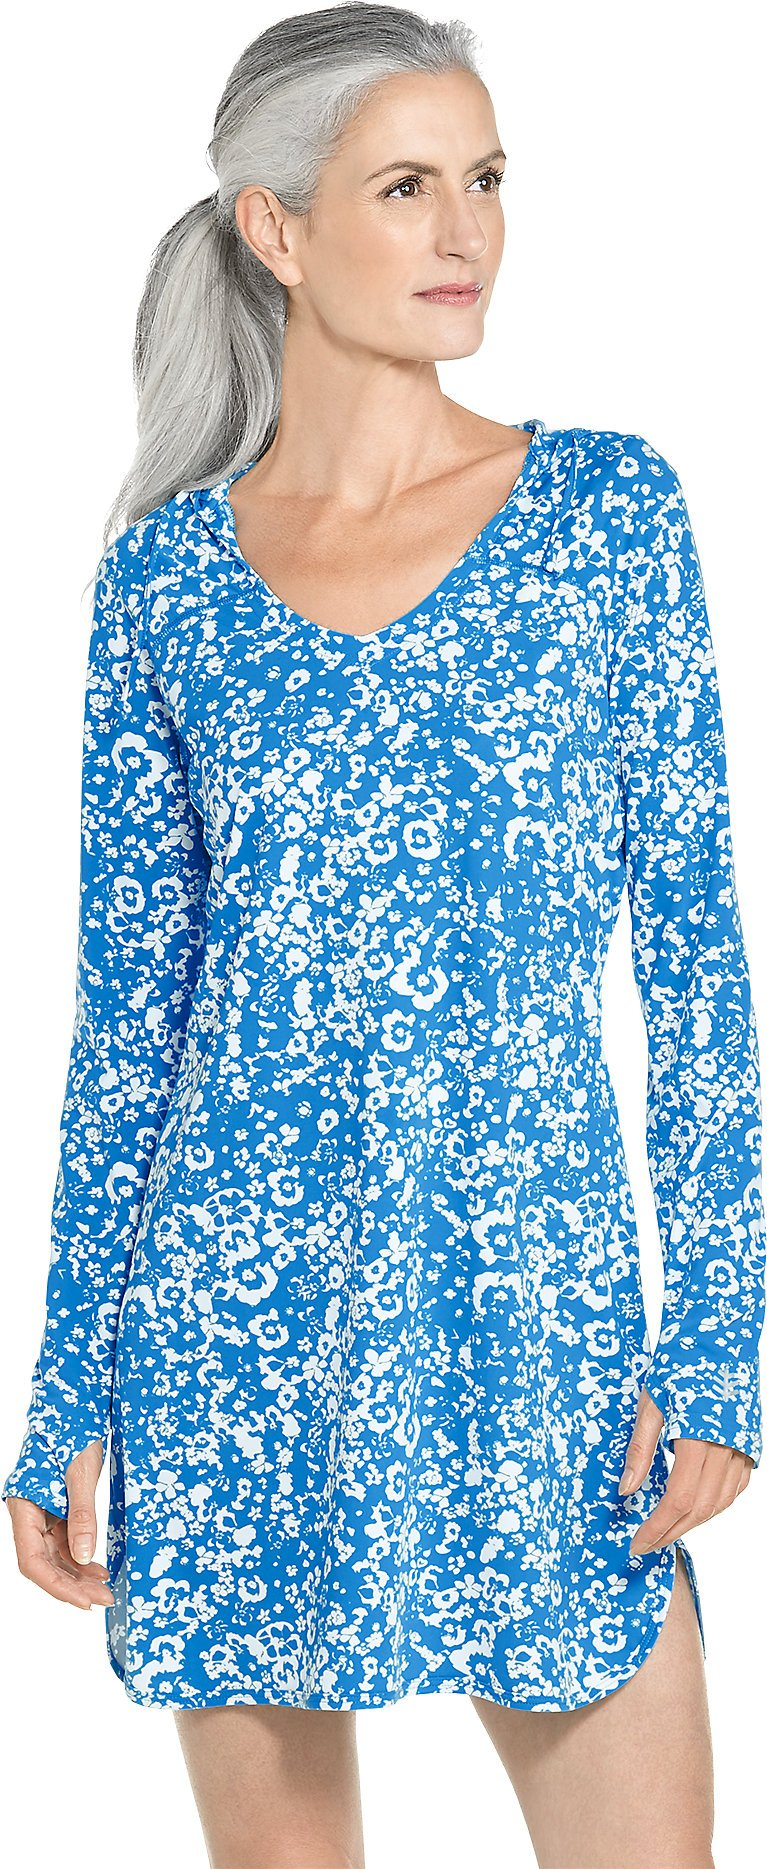 1ed4df20872 Coolibar UPF 50+ Women s Seacoast Swim Cover-Up Dress - Sun Protective  (Large- Brilliant Blue Floral)